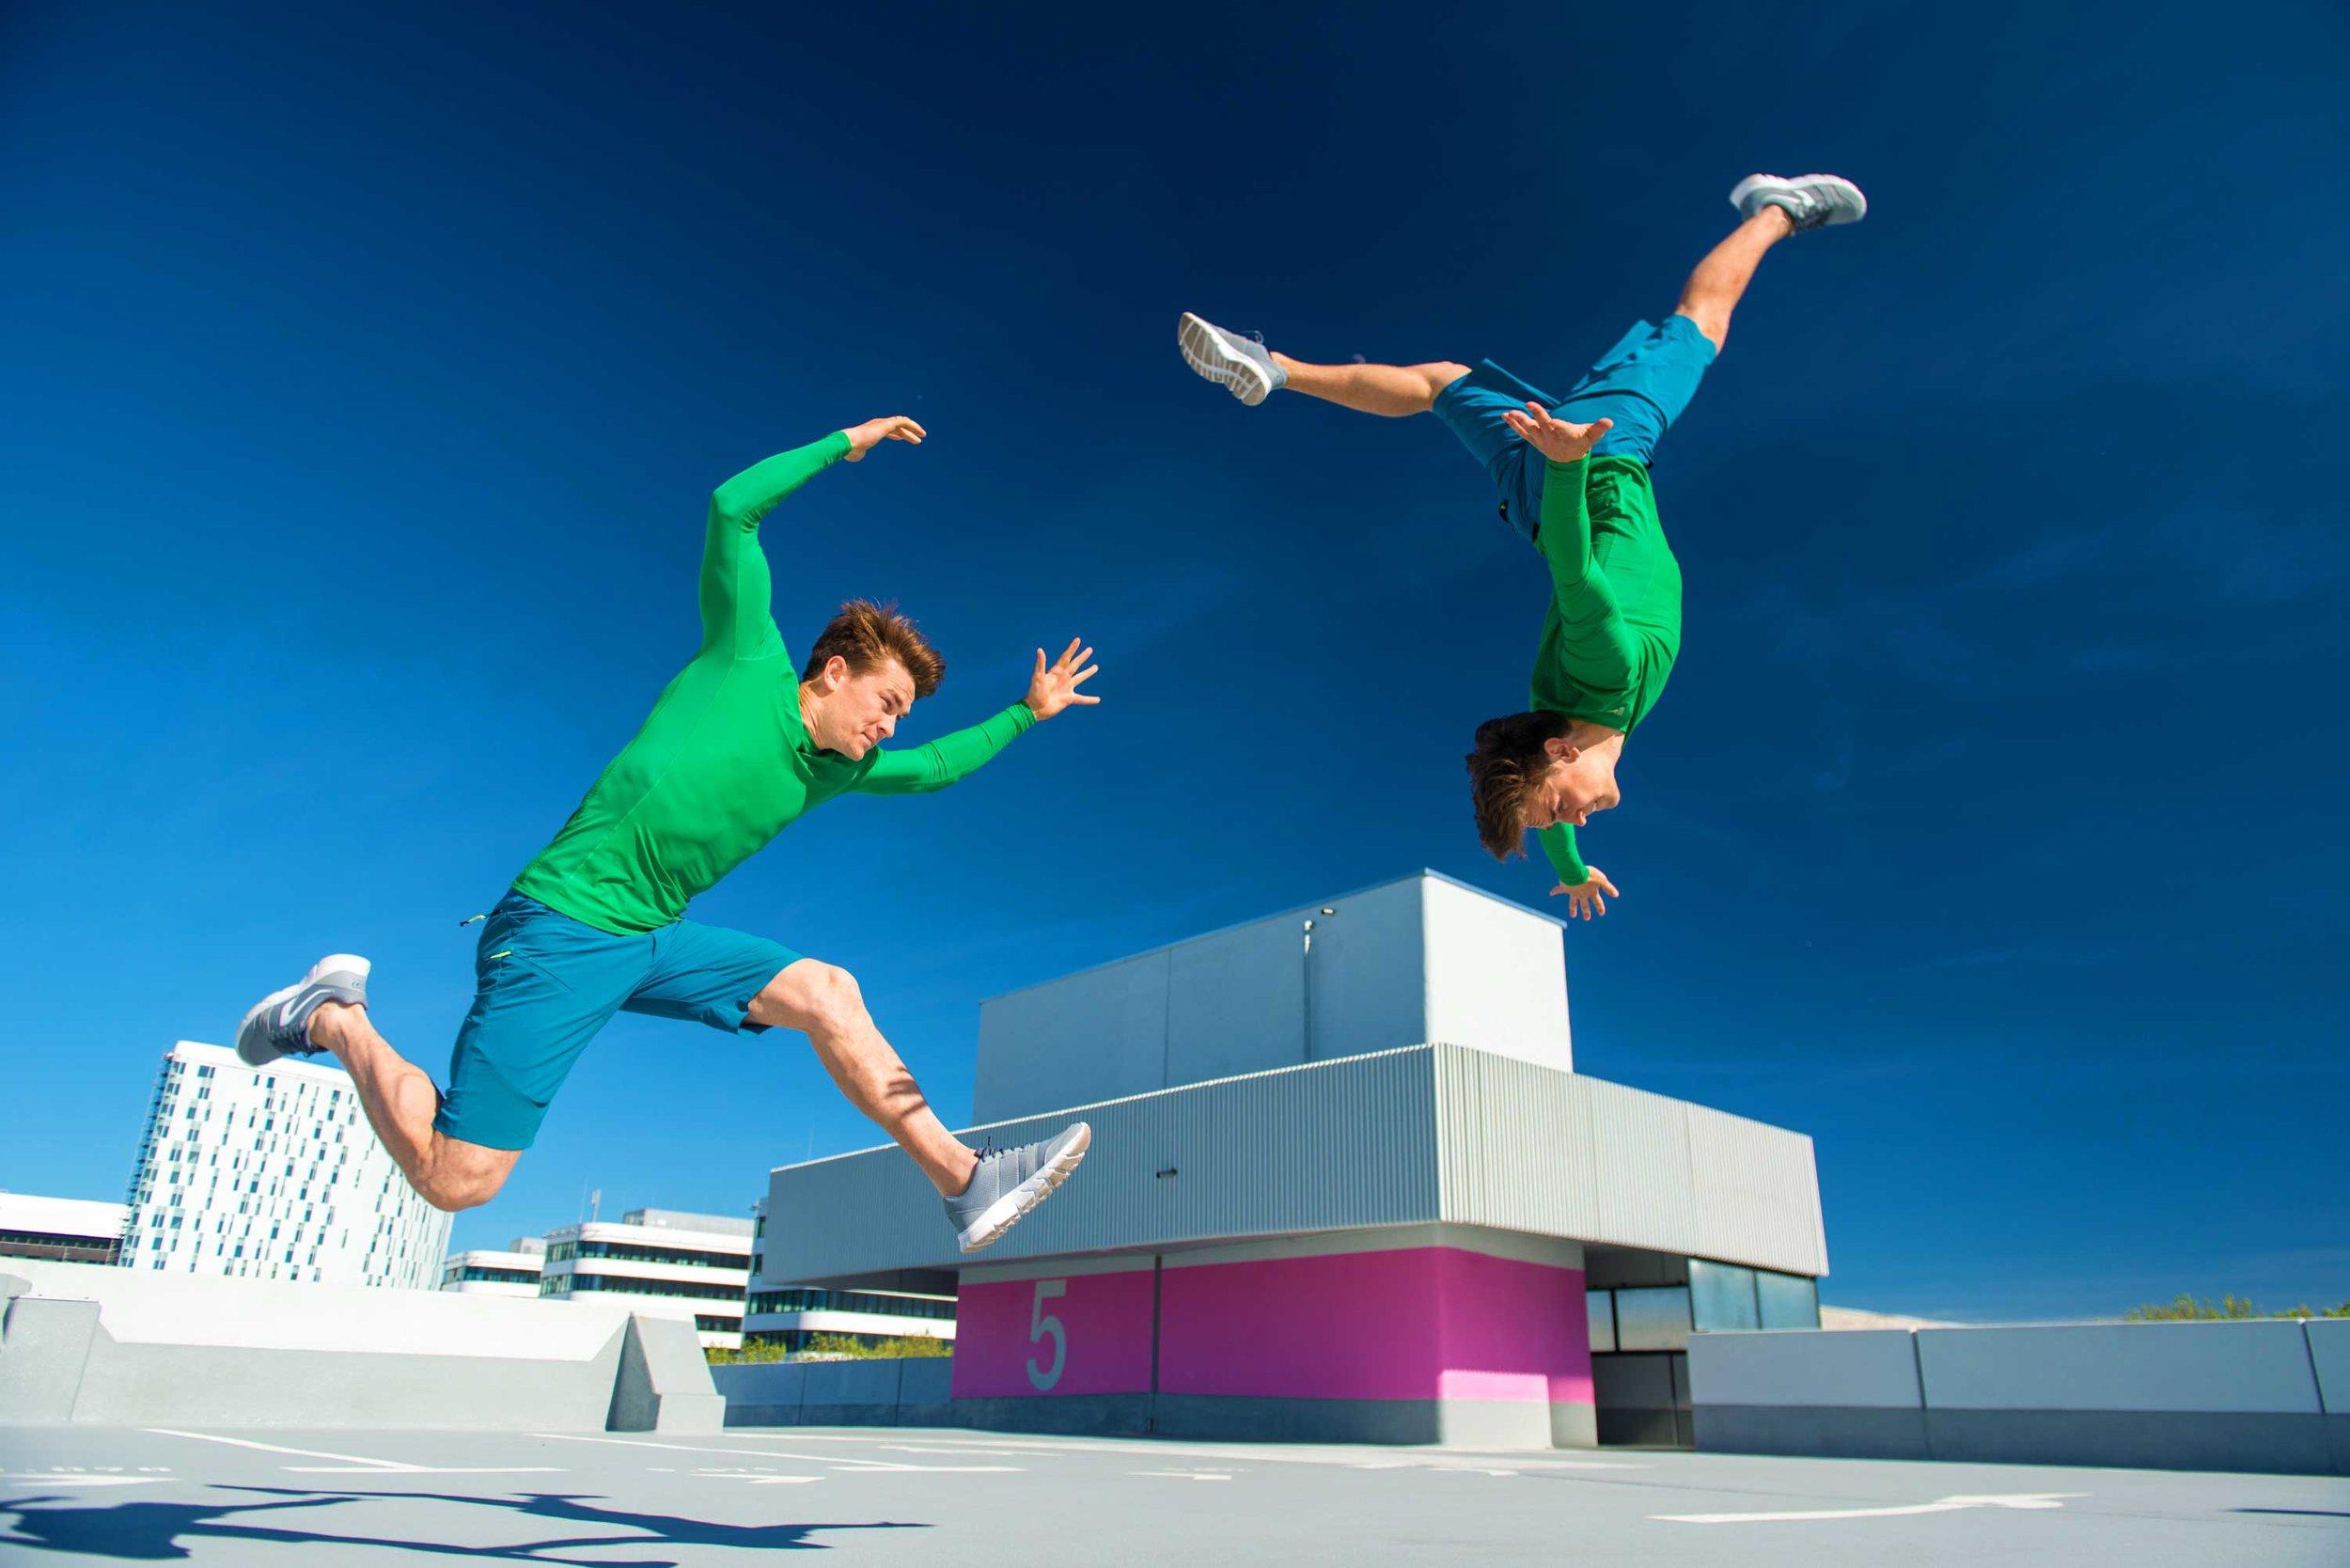 Dennys-Mamero-Photography-Sports-acrobatics-Jim-John-4.jpg